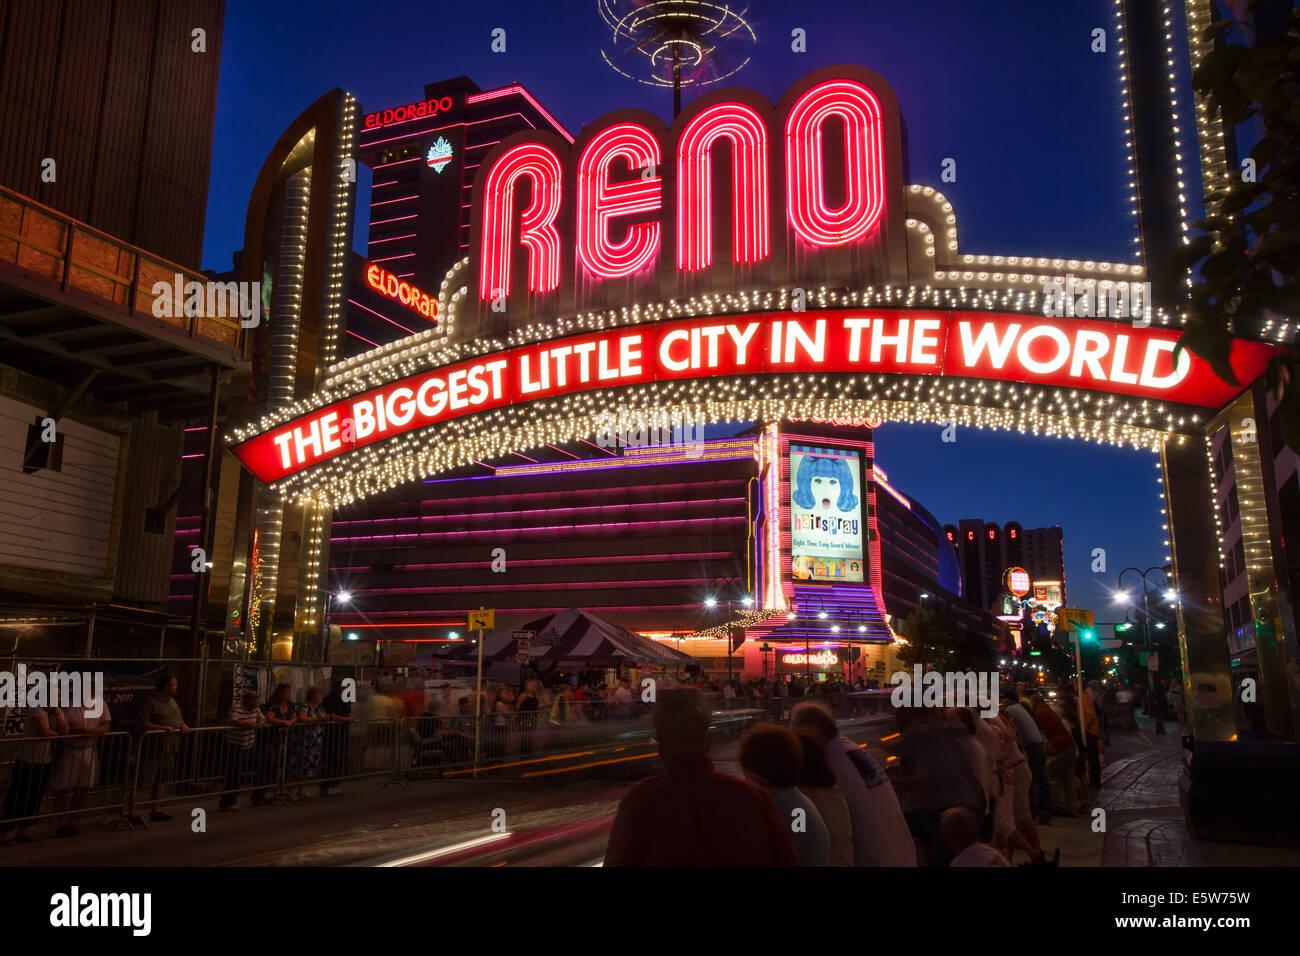 Reno Sign. Spectacular lights of Reno, Nevada. Iconic Reno Sign - Stock Image